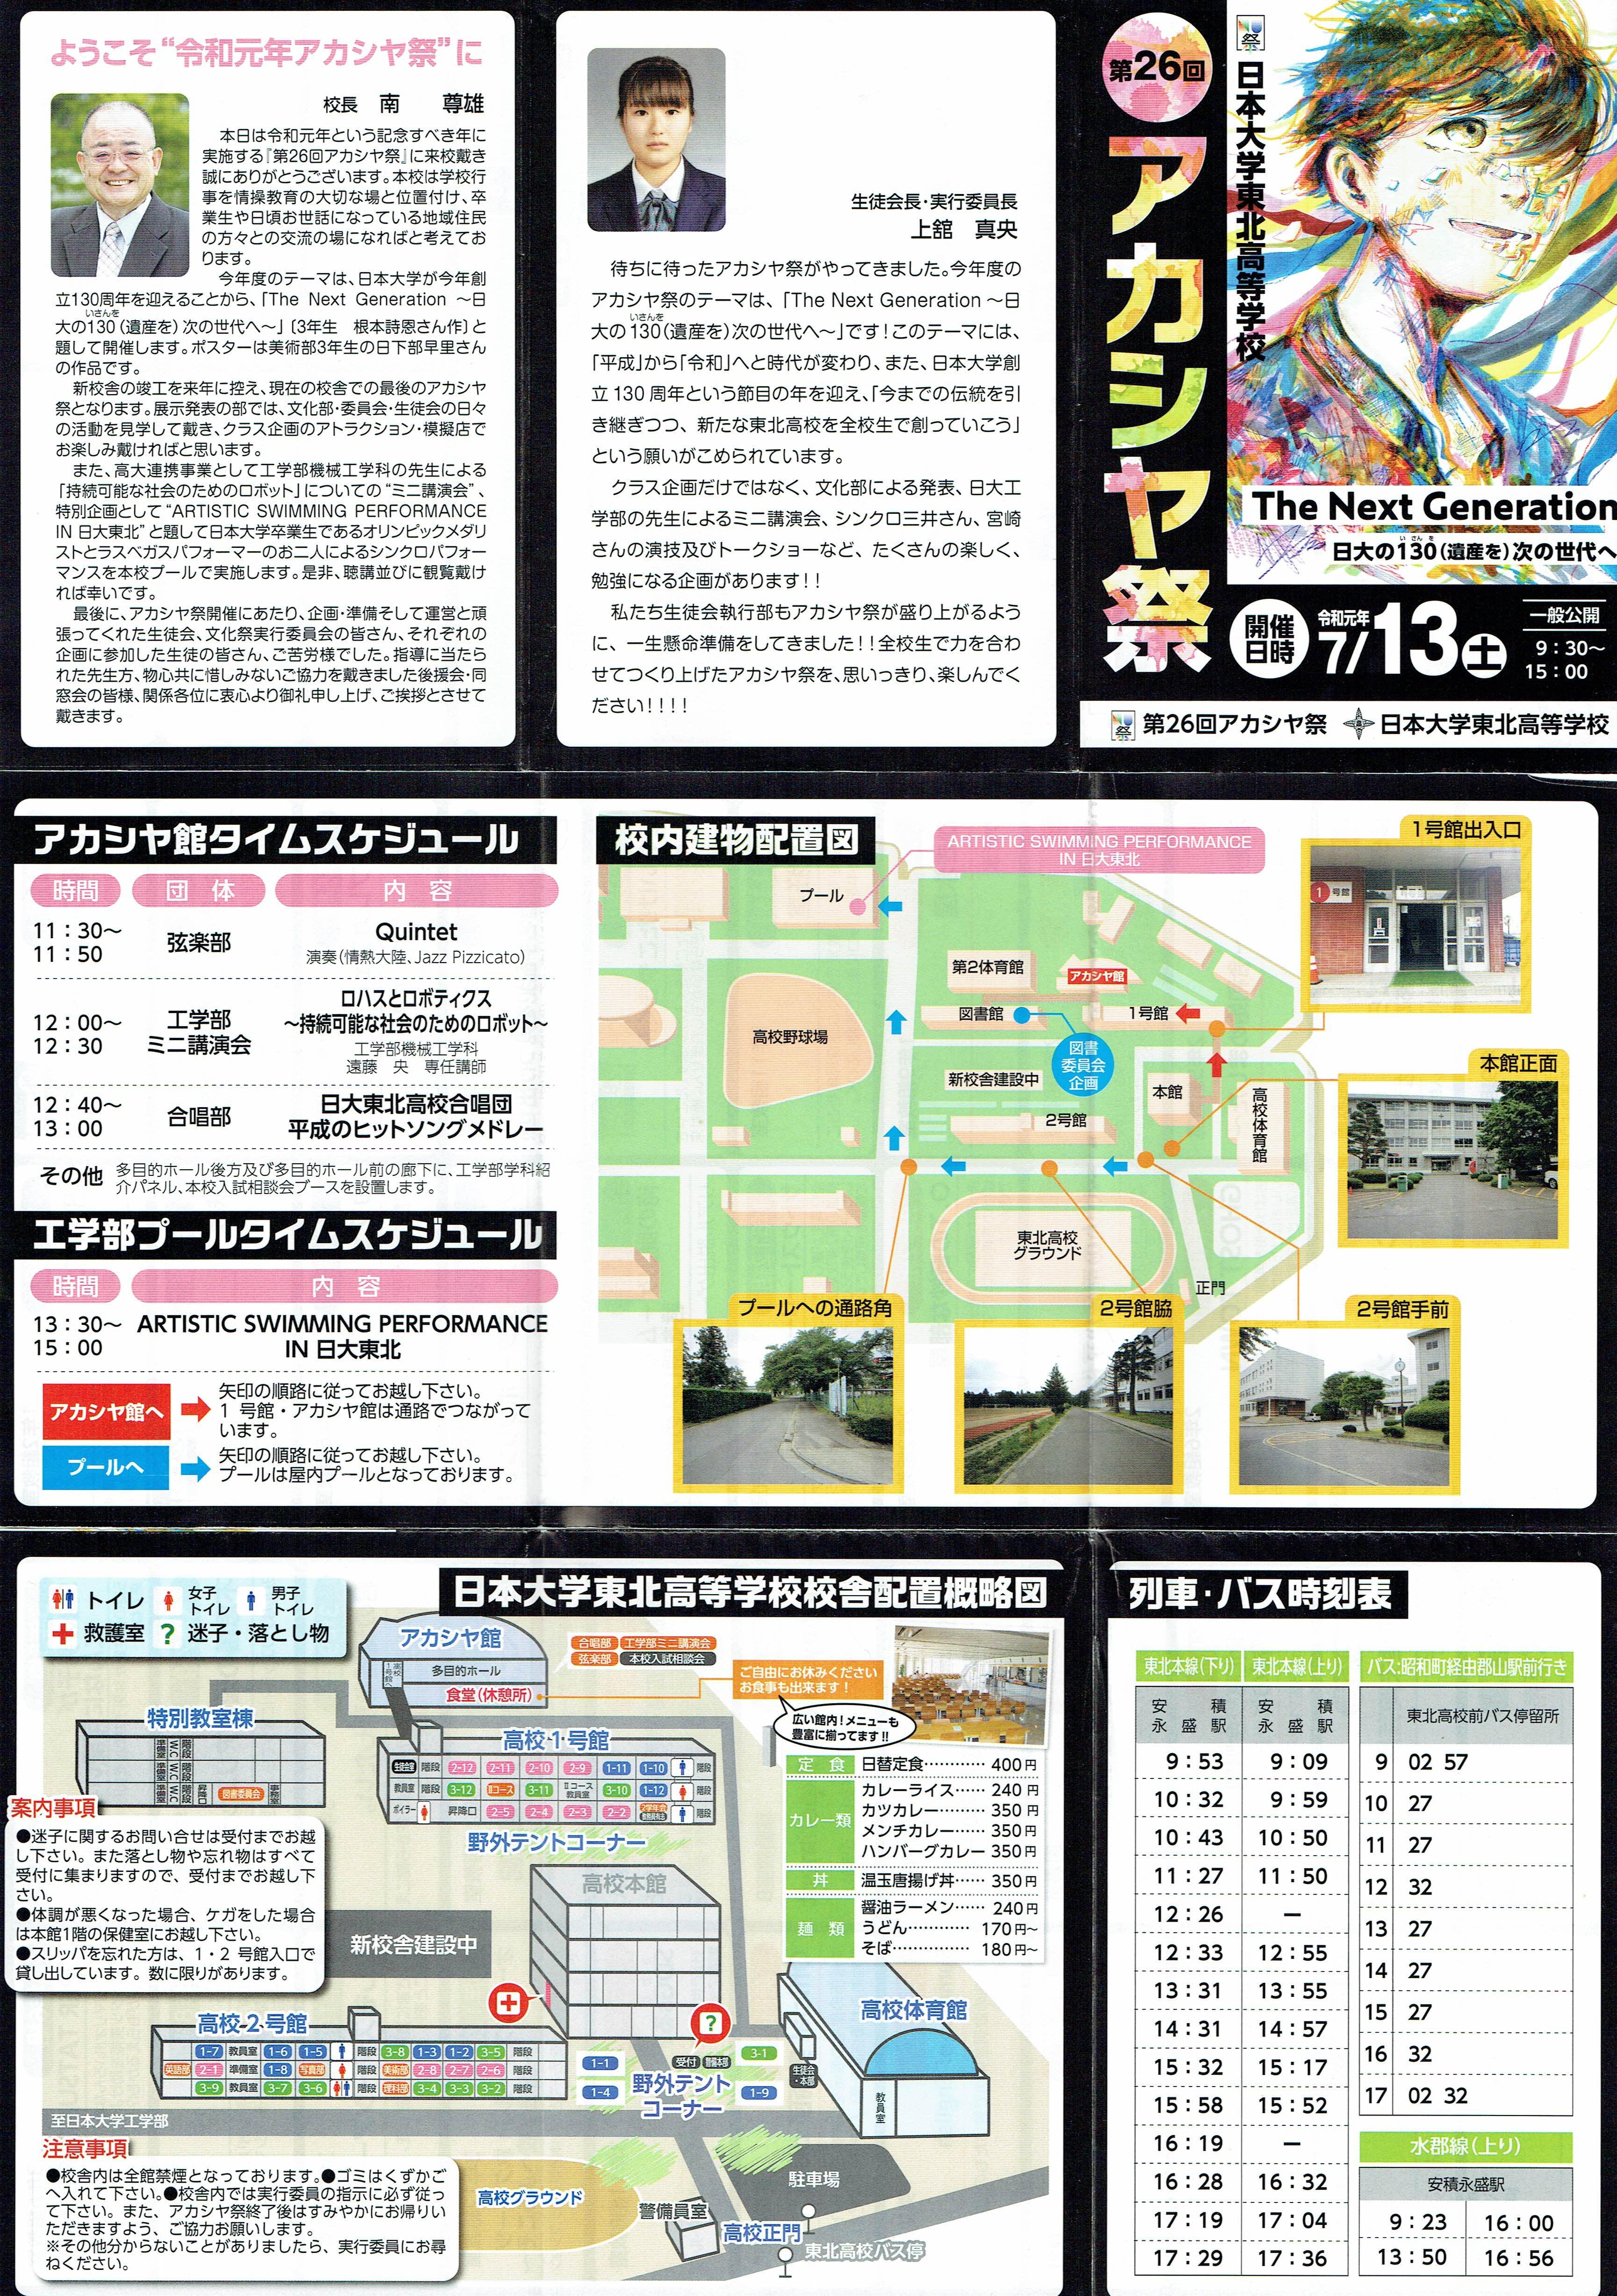 https://www.tohoku.hs.nihon-u.ac.jp/information/files/%E3%82%A2%E3%82%AB%E3%82%B7%E3%83%A4%E7%A5%AD%E3%83%91%E3%83%B3%E3%83%95%EF%BC%91R1.jpg